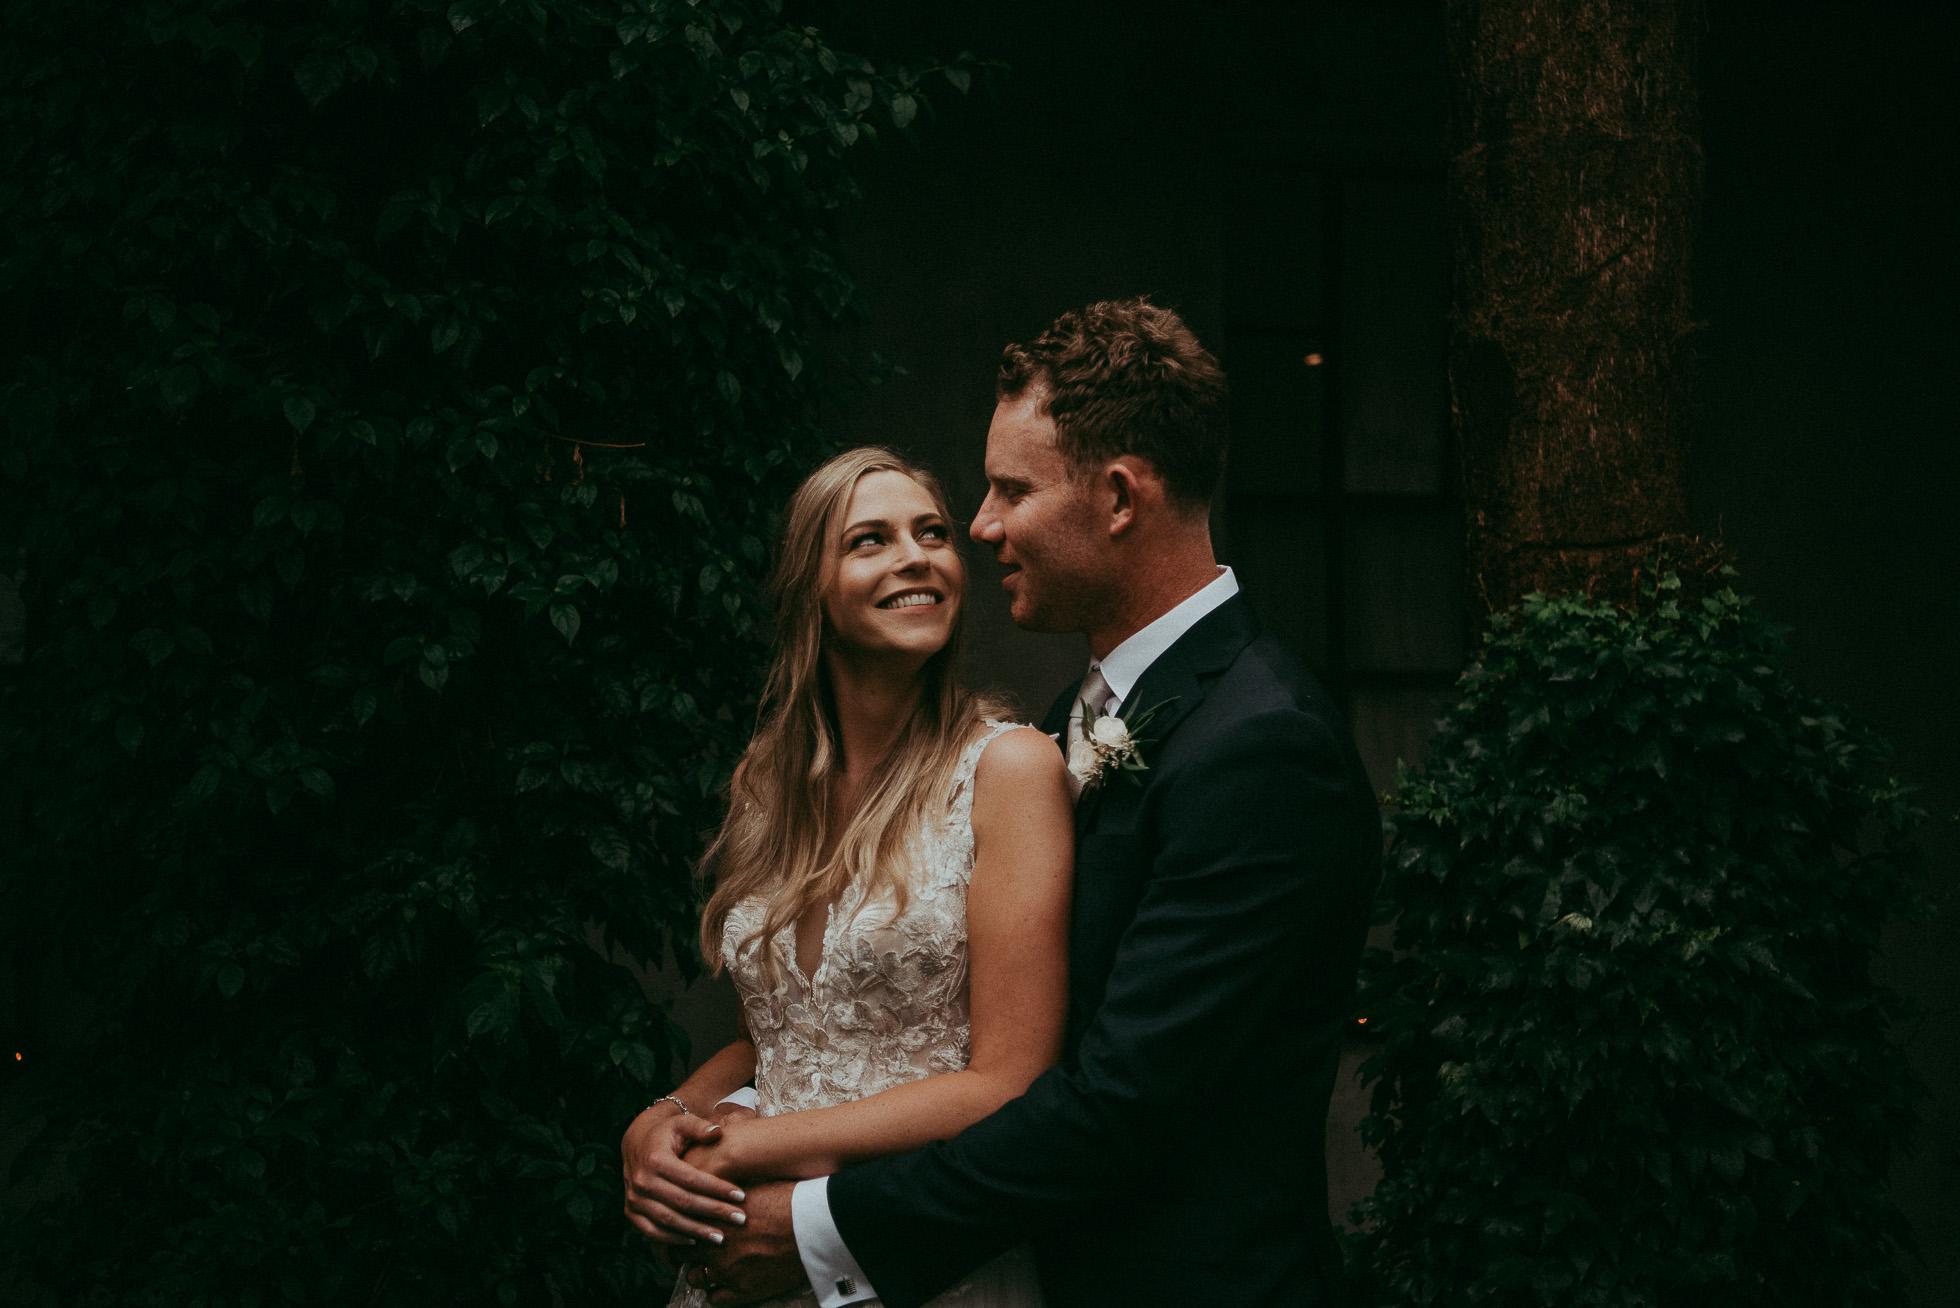 Mantells - Auckland city wedding venue - photographers